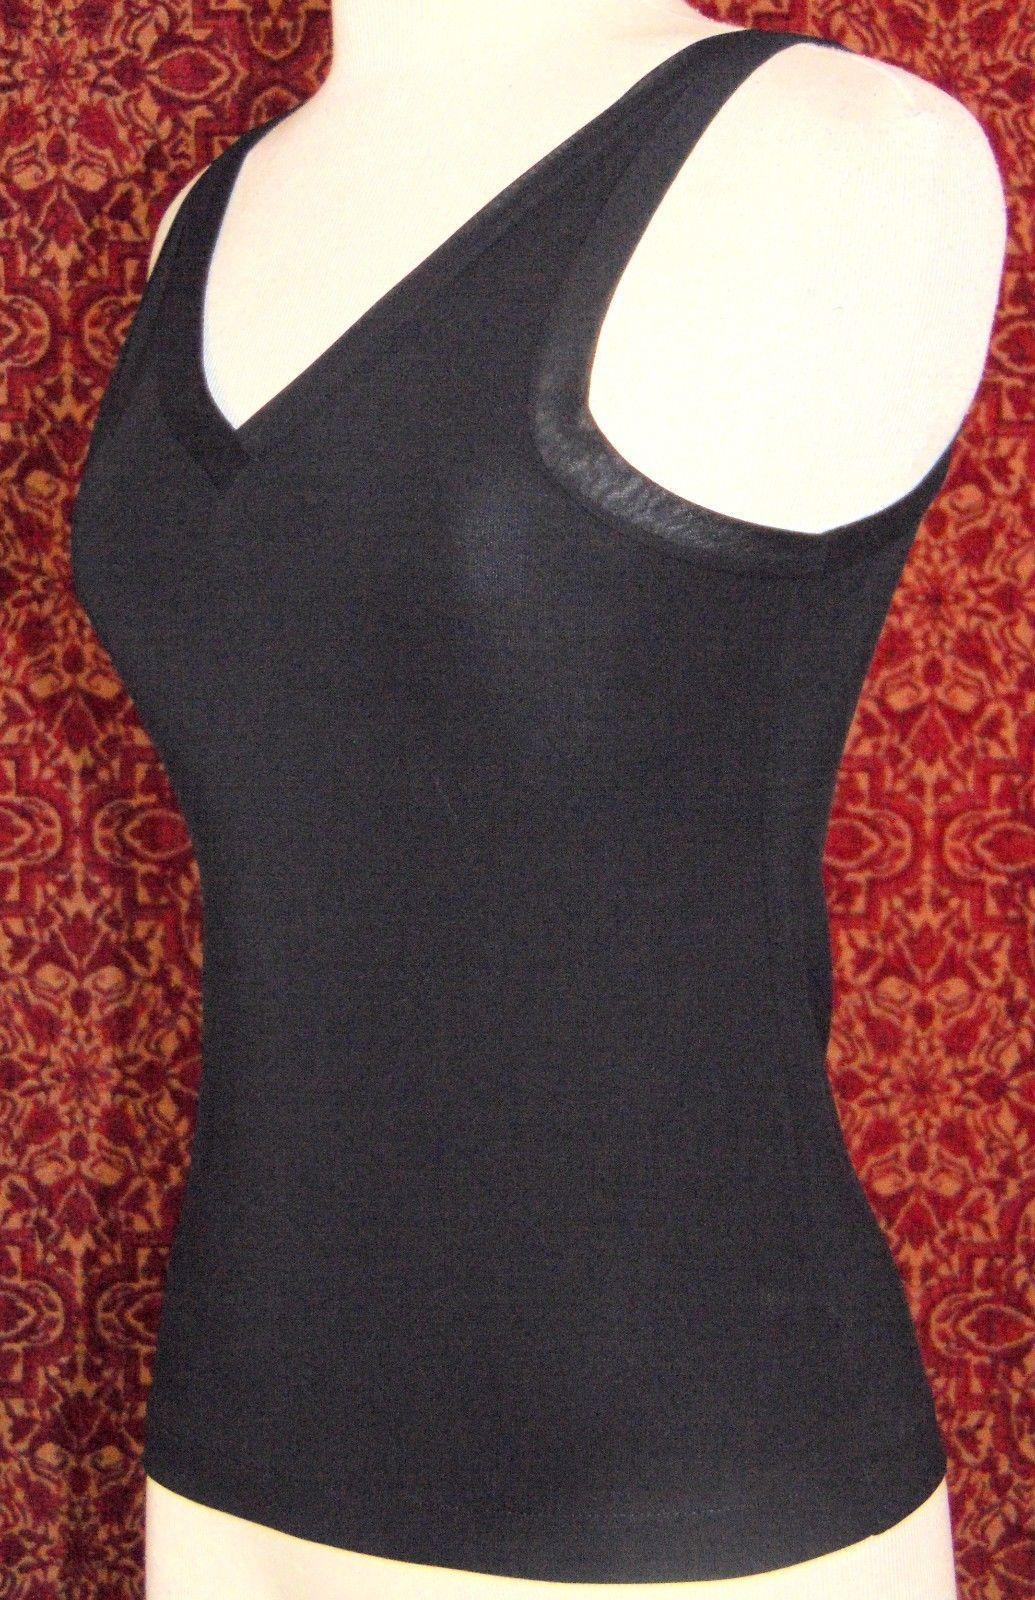 DKNY black rayon polyester blend stretch knit tank top P  (T48-03B8G)